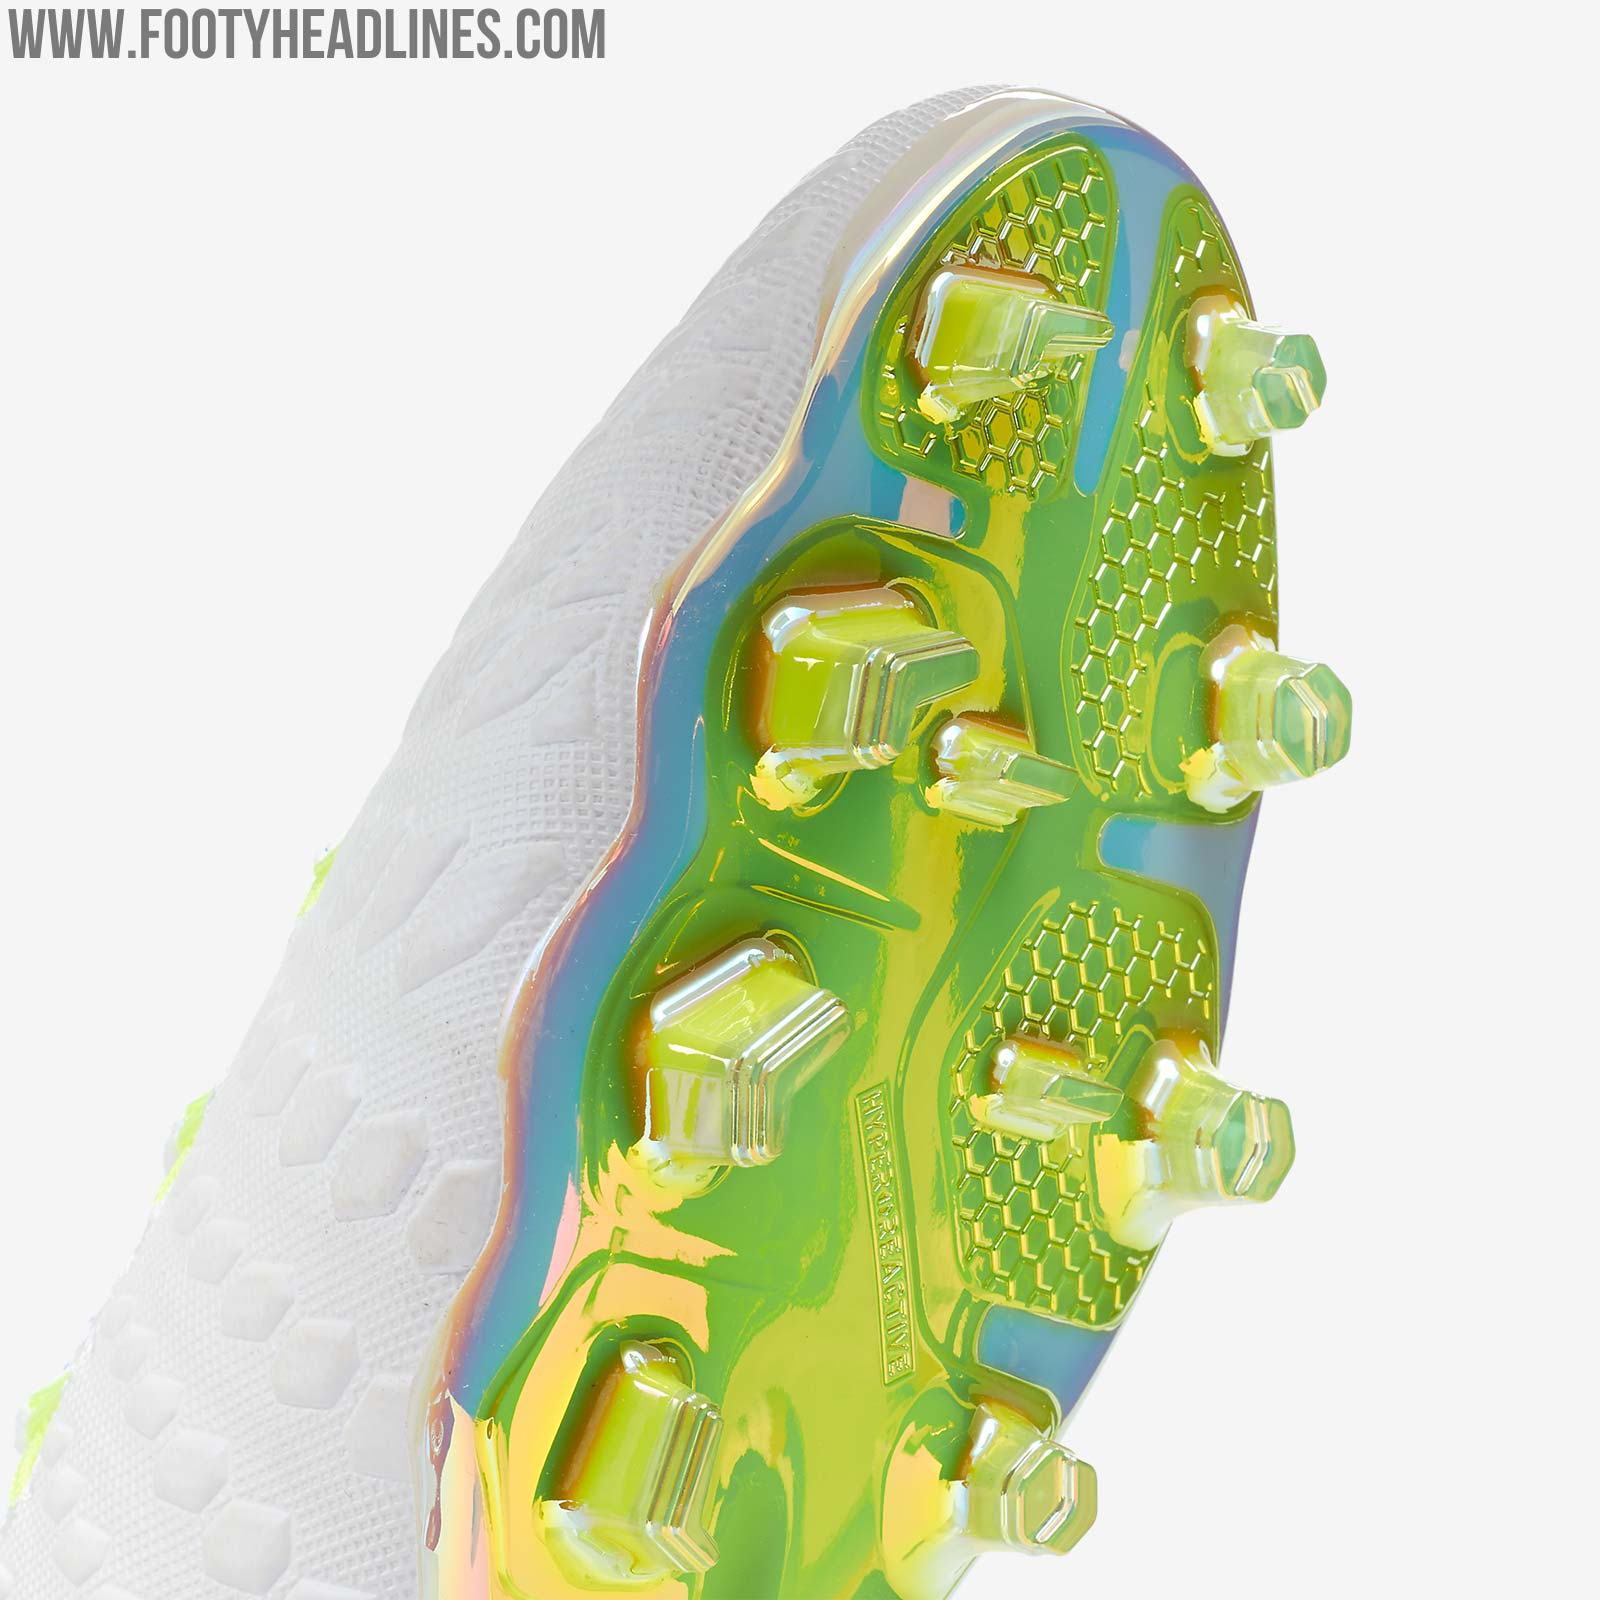 Nike Hypervenom Phantom III 2018 World Cup Boots Revealed - Footy Headlines